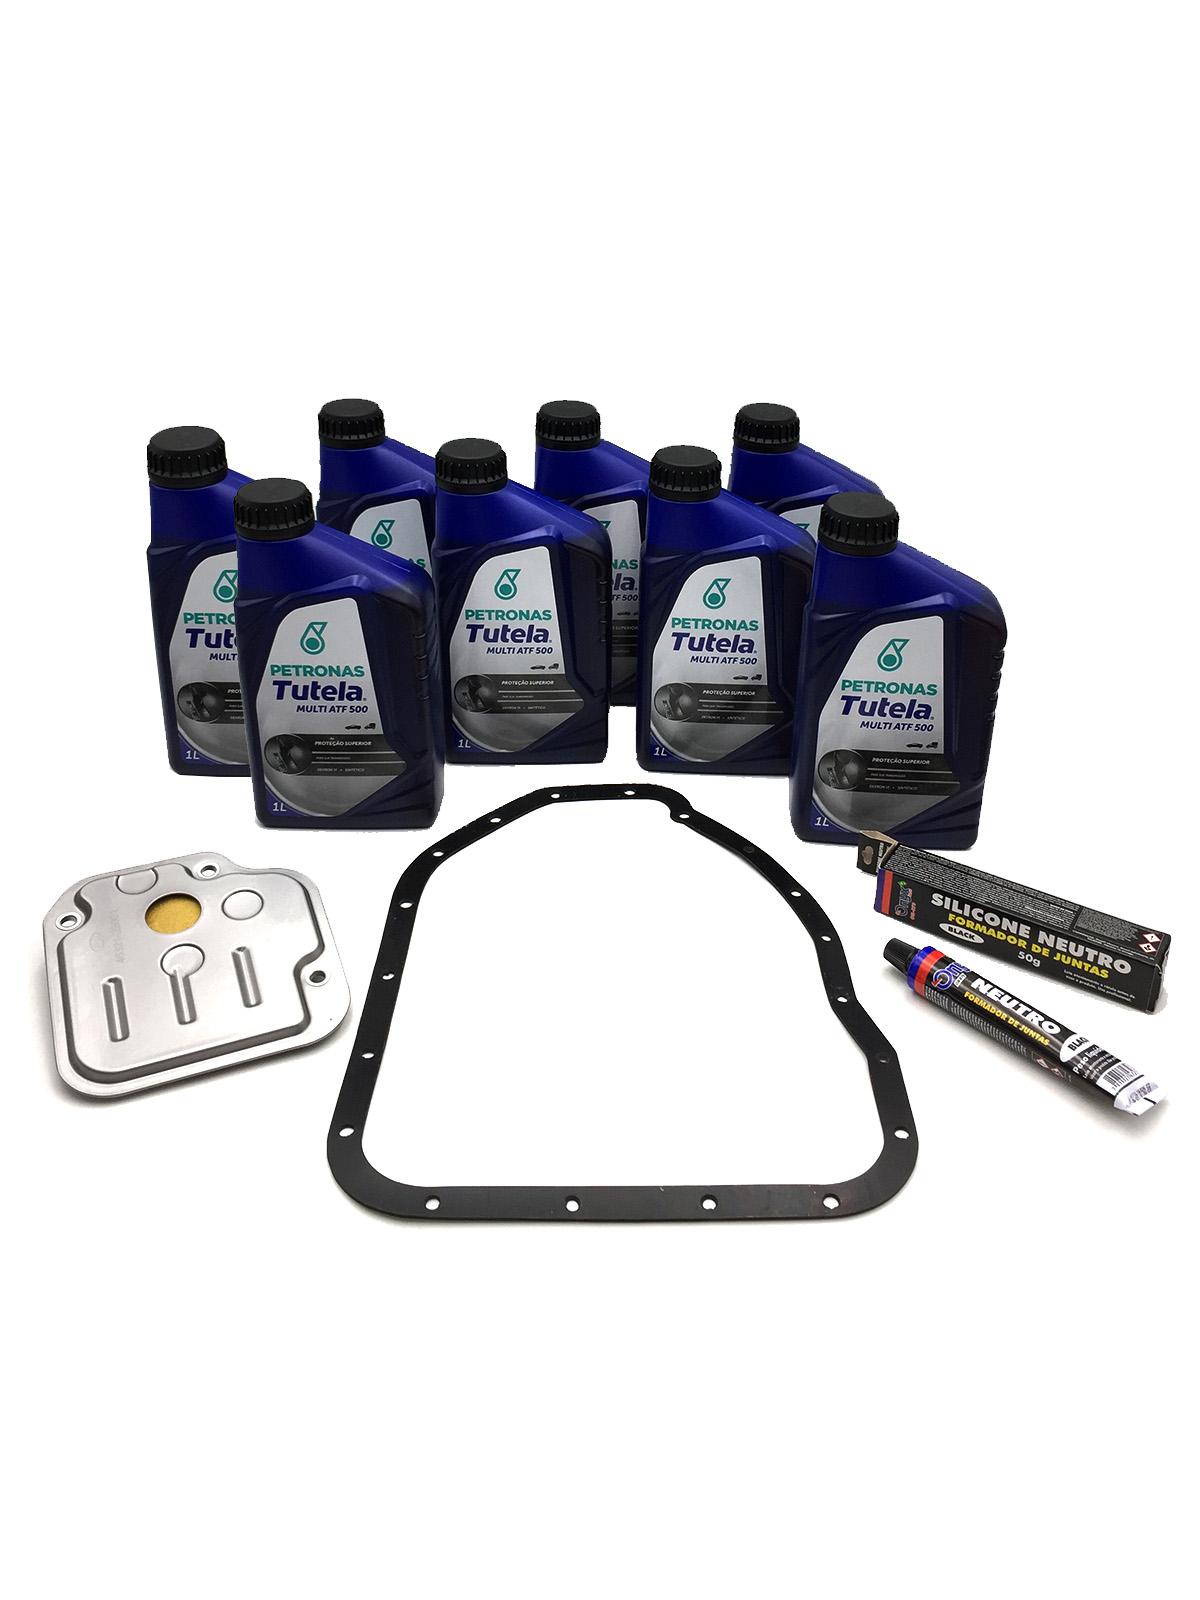 Kit Troca de Óleo Petronas Tutela Multi ATF 500 | Dexron VI (08 Lts.) - Câmbio A4CF1 - Hyundai